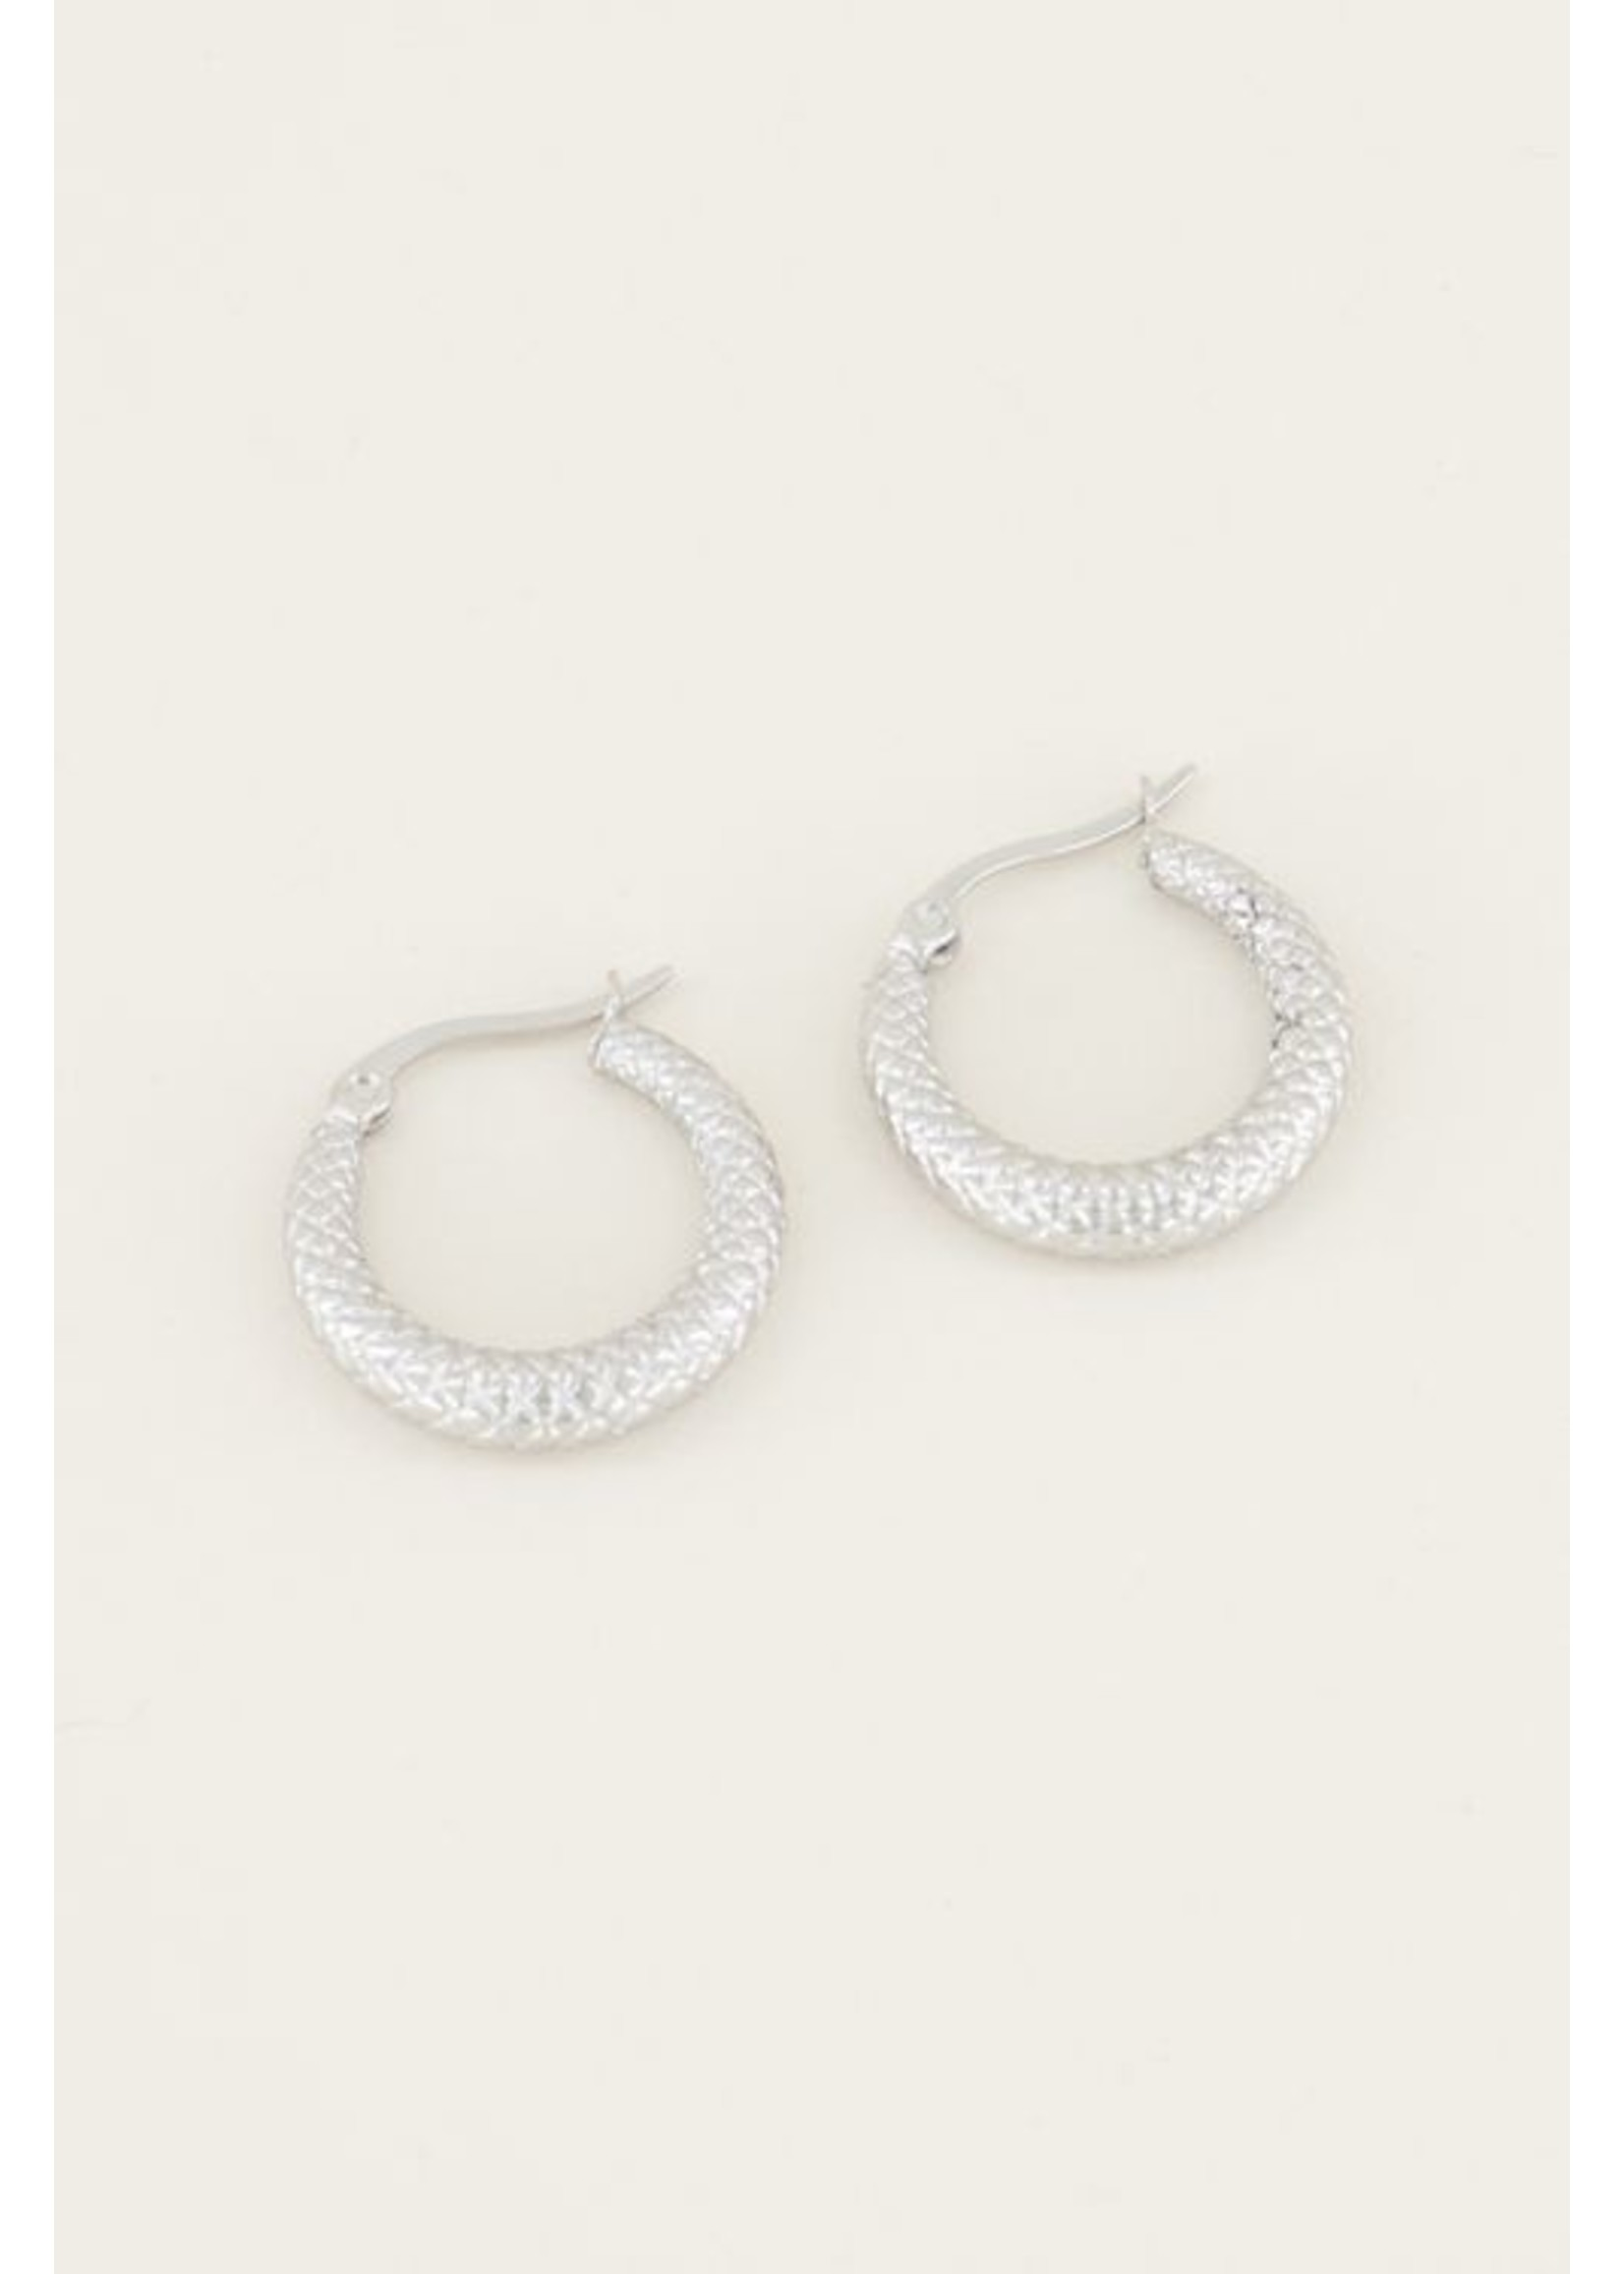 My Jewellery Oorringn geruit patroon zilver